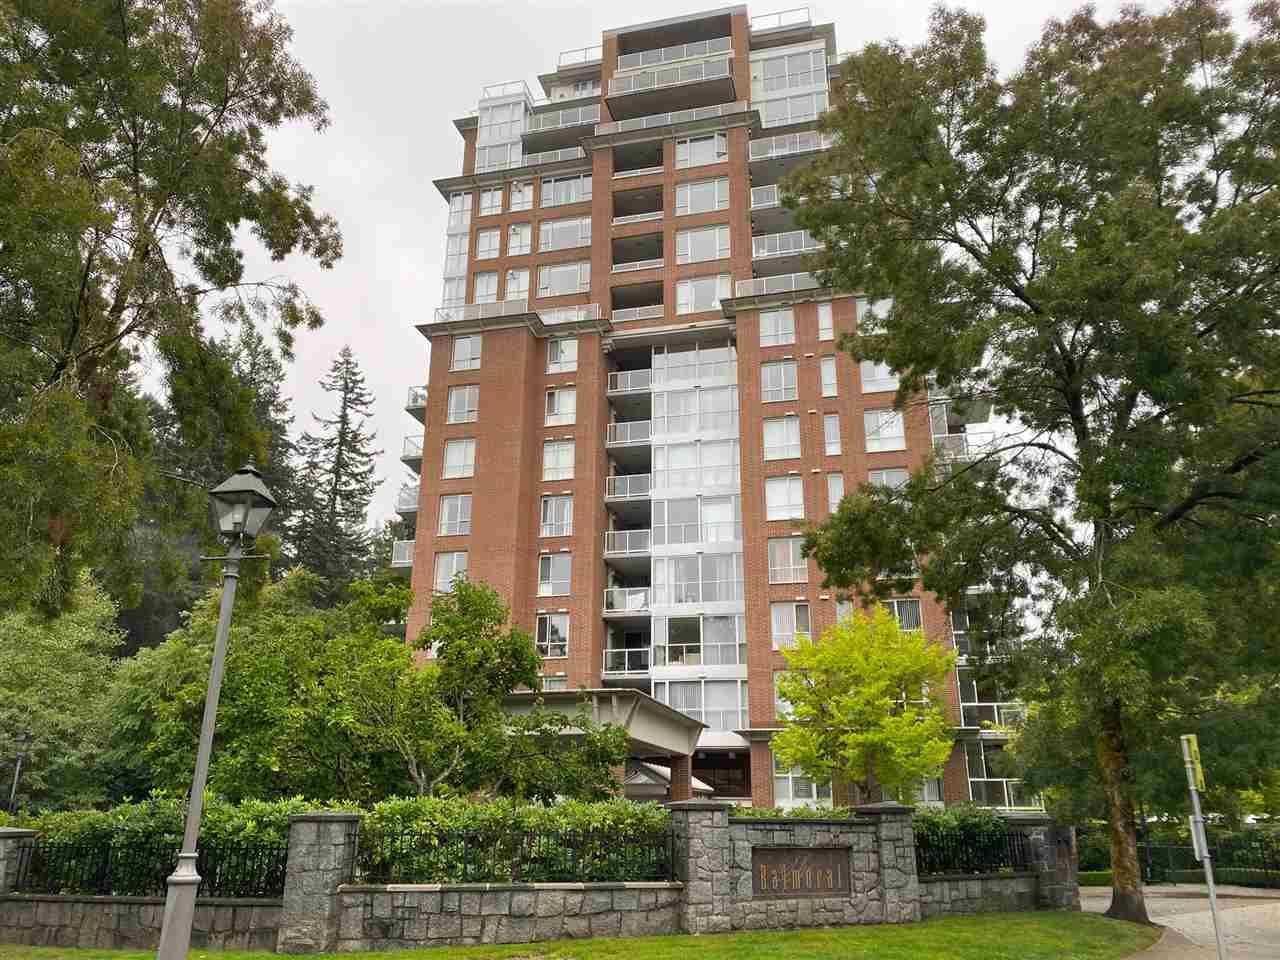 Main Photo: 1503 5615 HAMPTON PLACE in Vancouver: University VW Condo for sale (Vancouver West)  : MLS®# R2504856